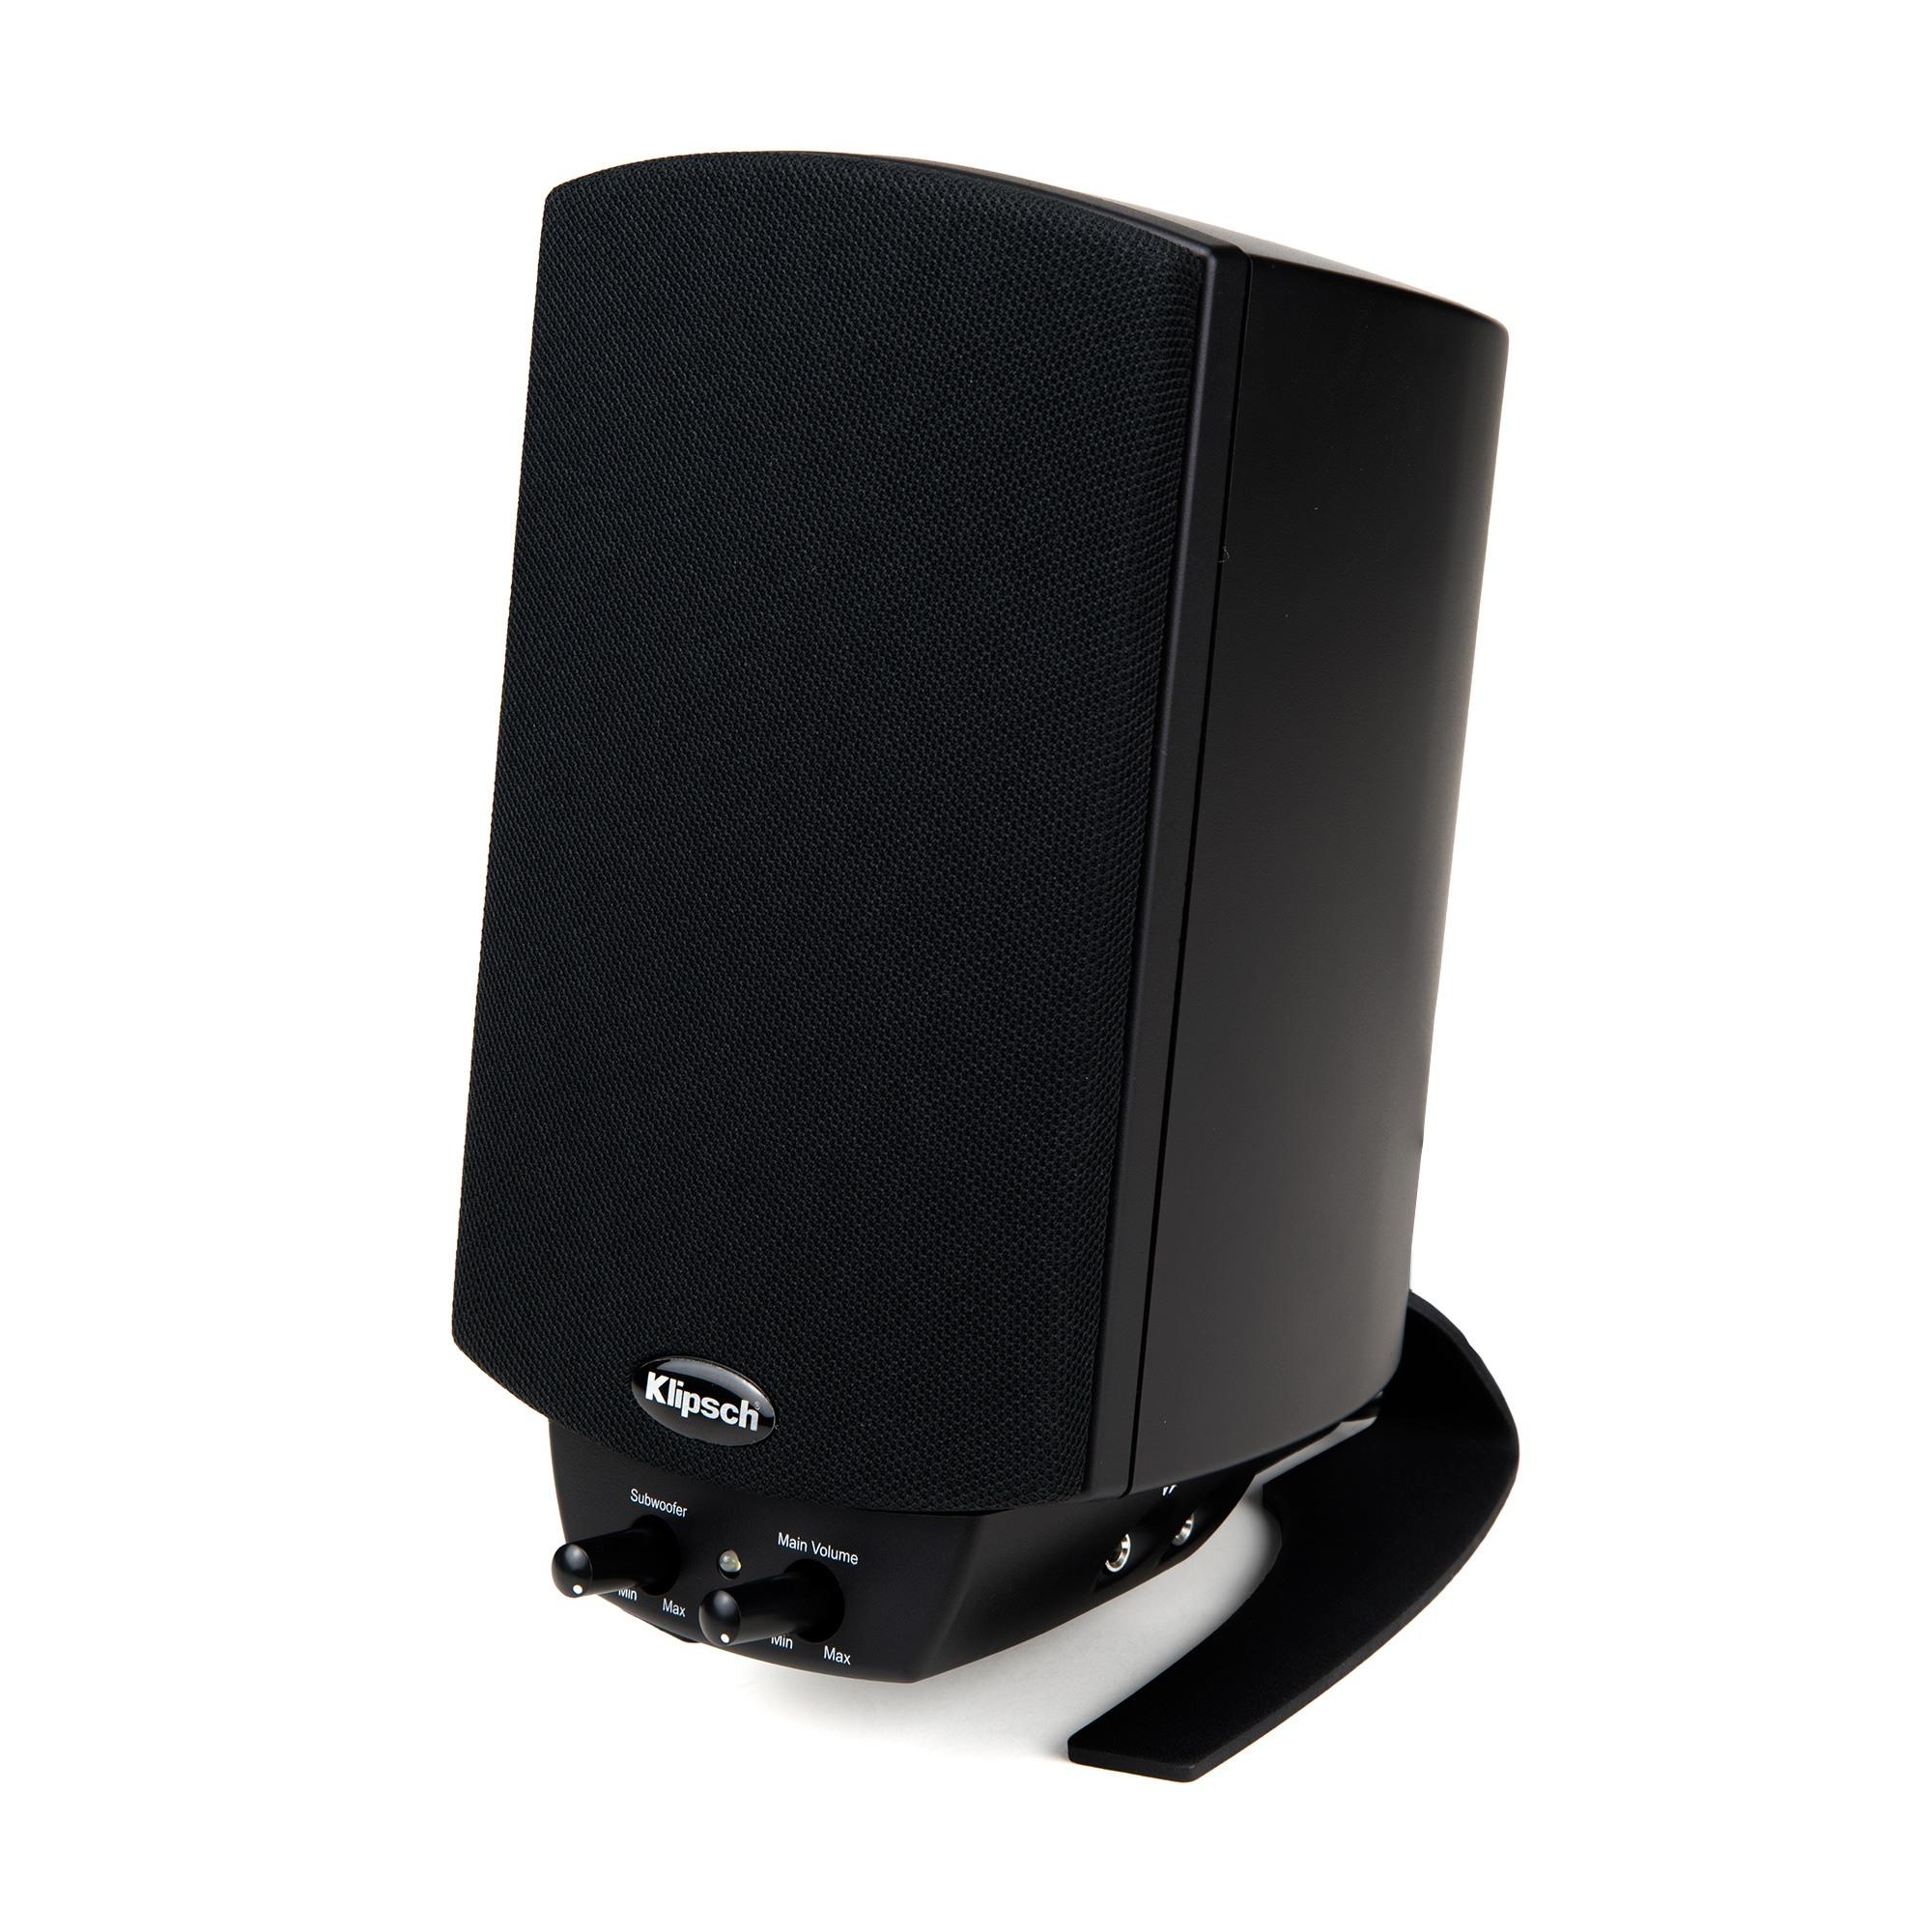 Klipsch Promedia 2 1 Bluetooth Computer Speaker System